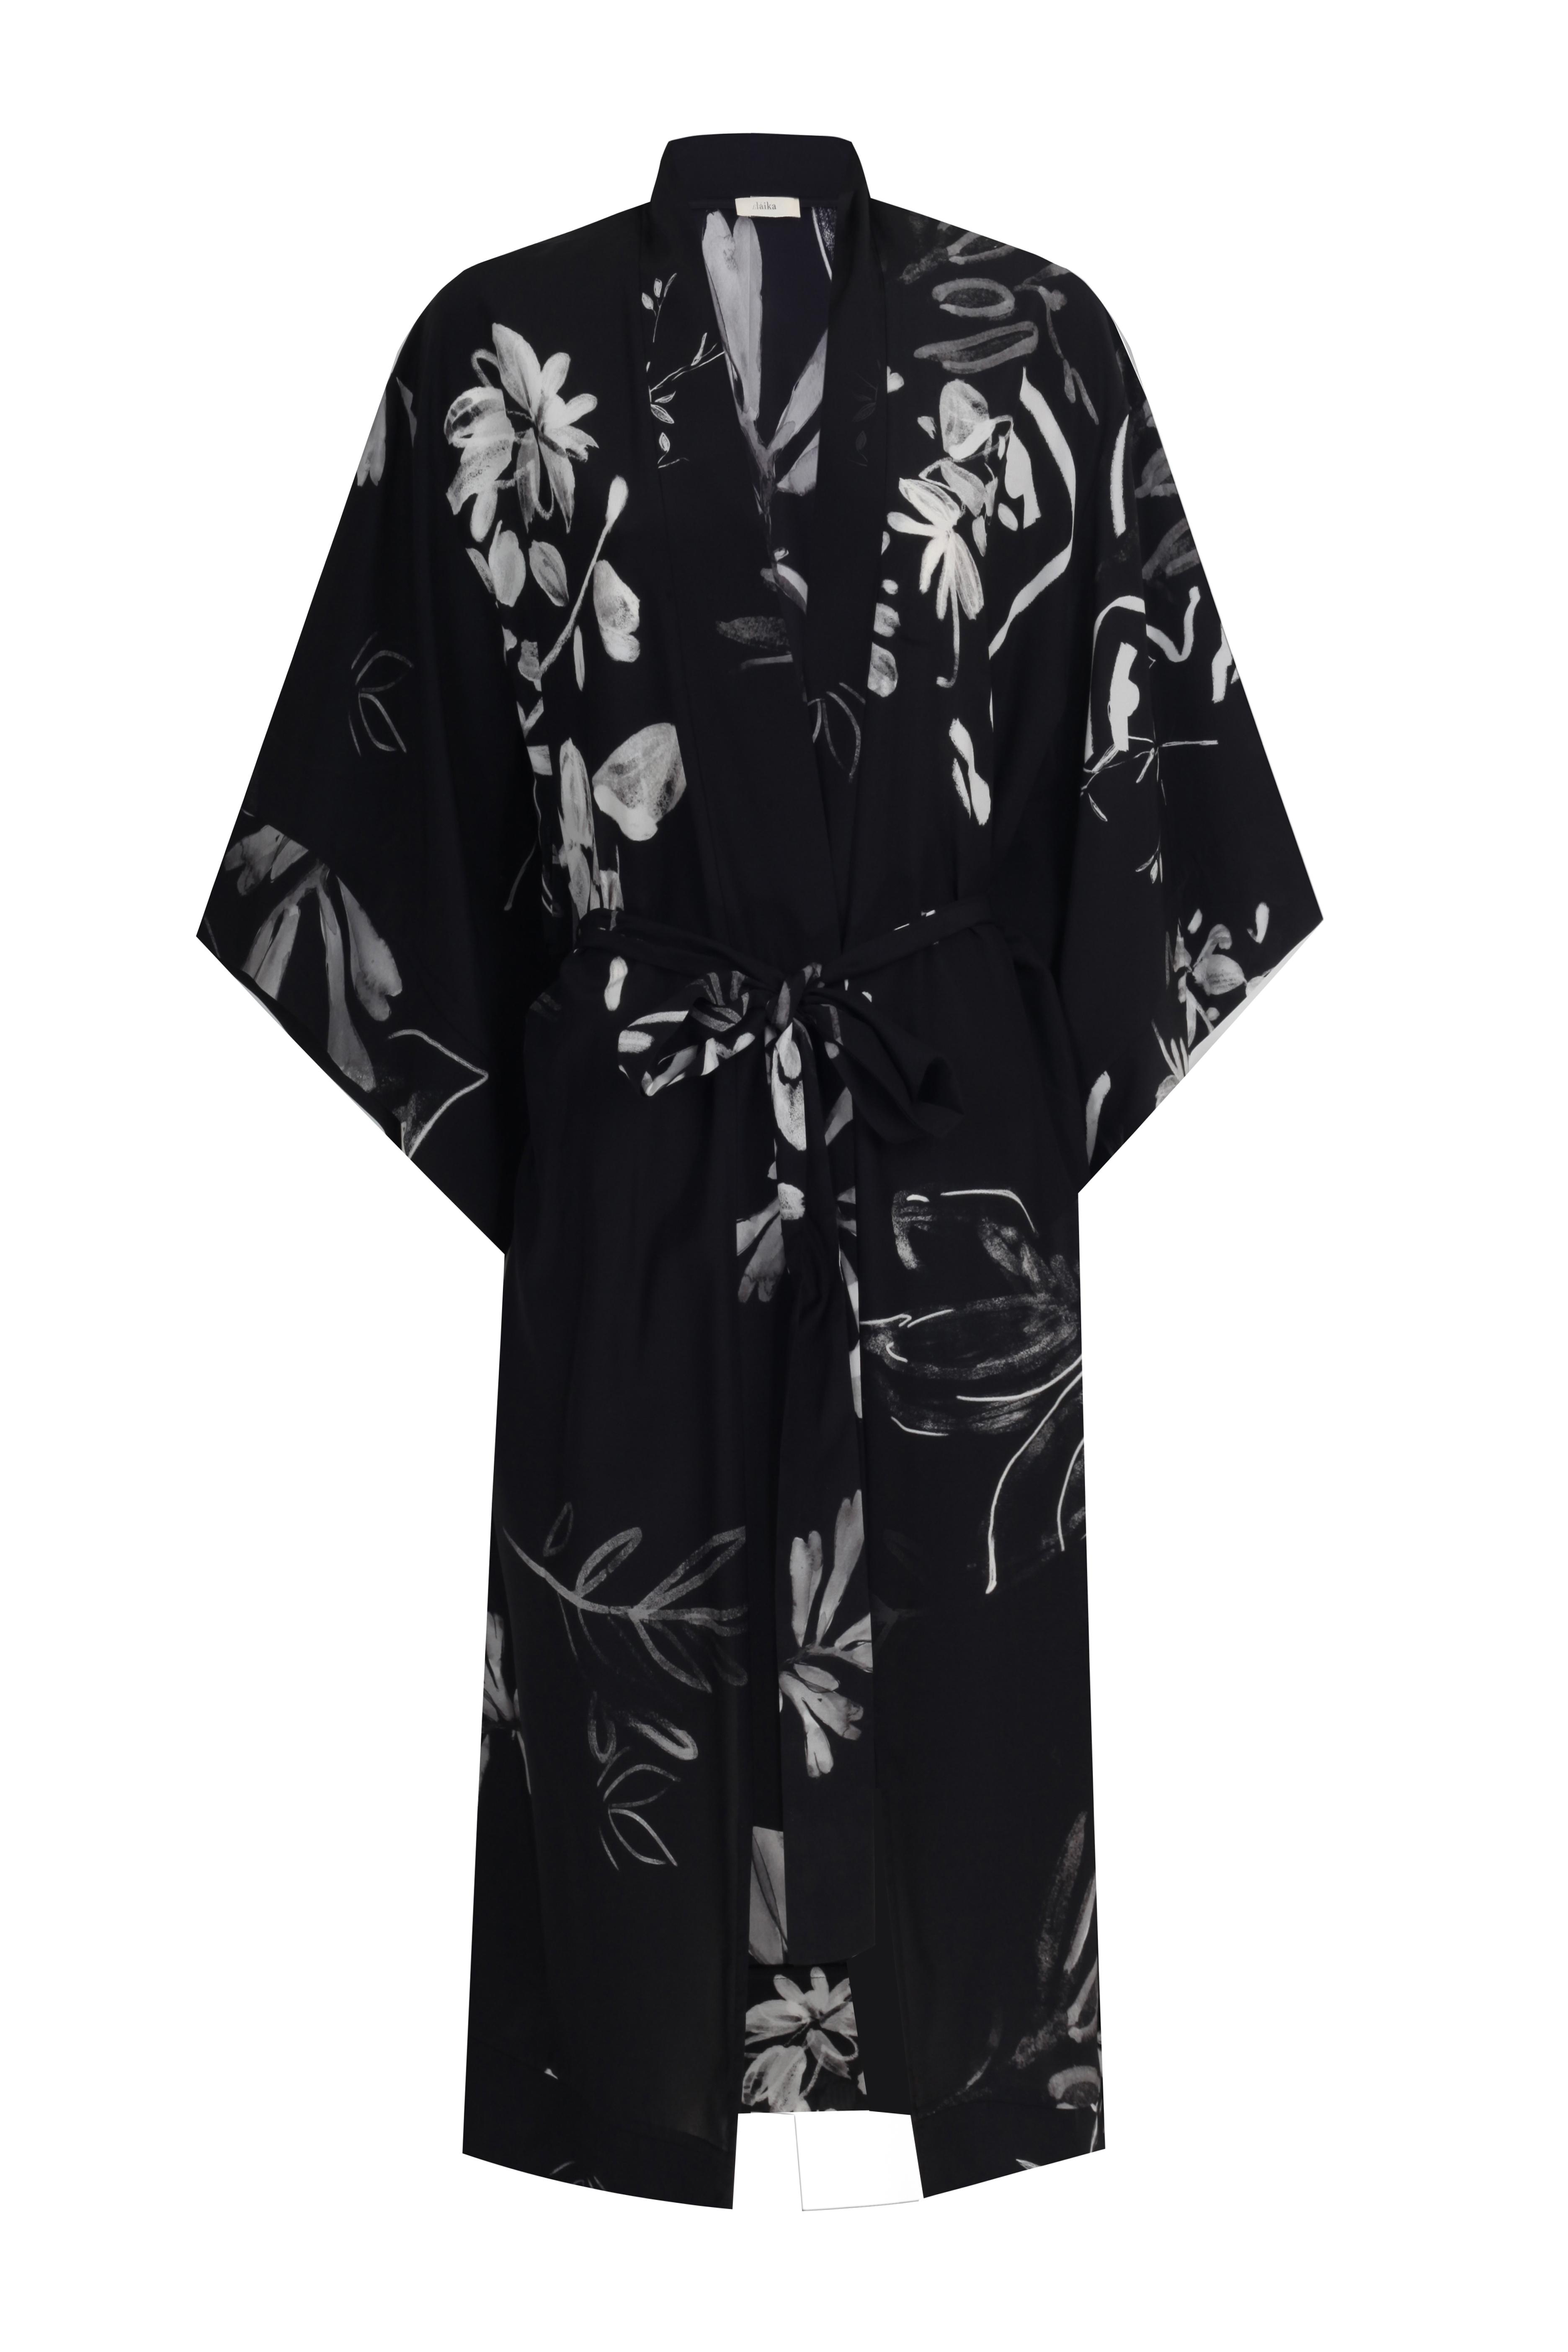 Yoko Kimono by Laika on curated-crowd.com